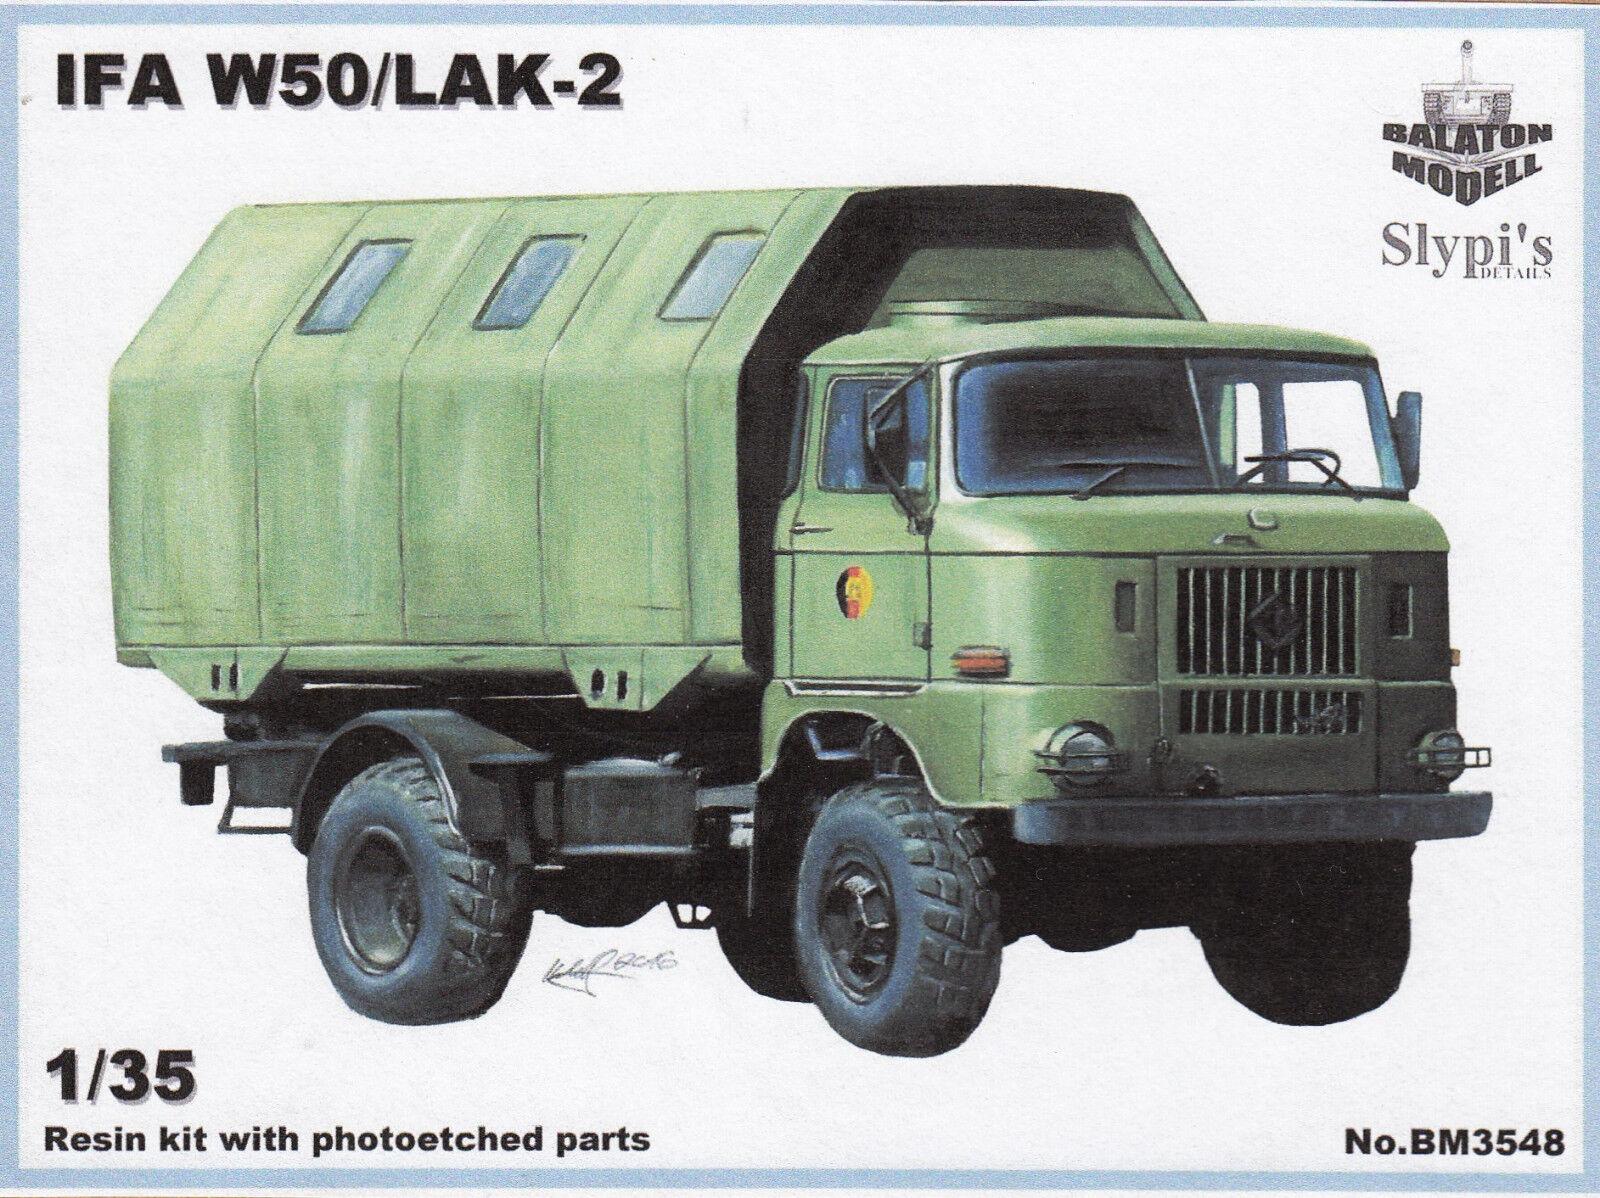 Bm3548  Balaton Modell - IFA W50   LAK-2 - Resin - 1 35 - TOPP MODELL  | Lass unsere Waren in die Welt gehen